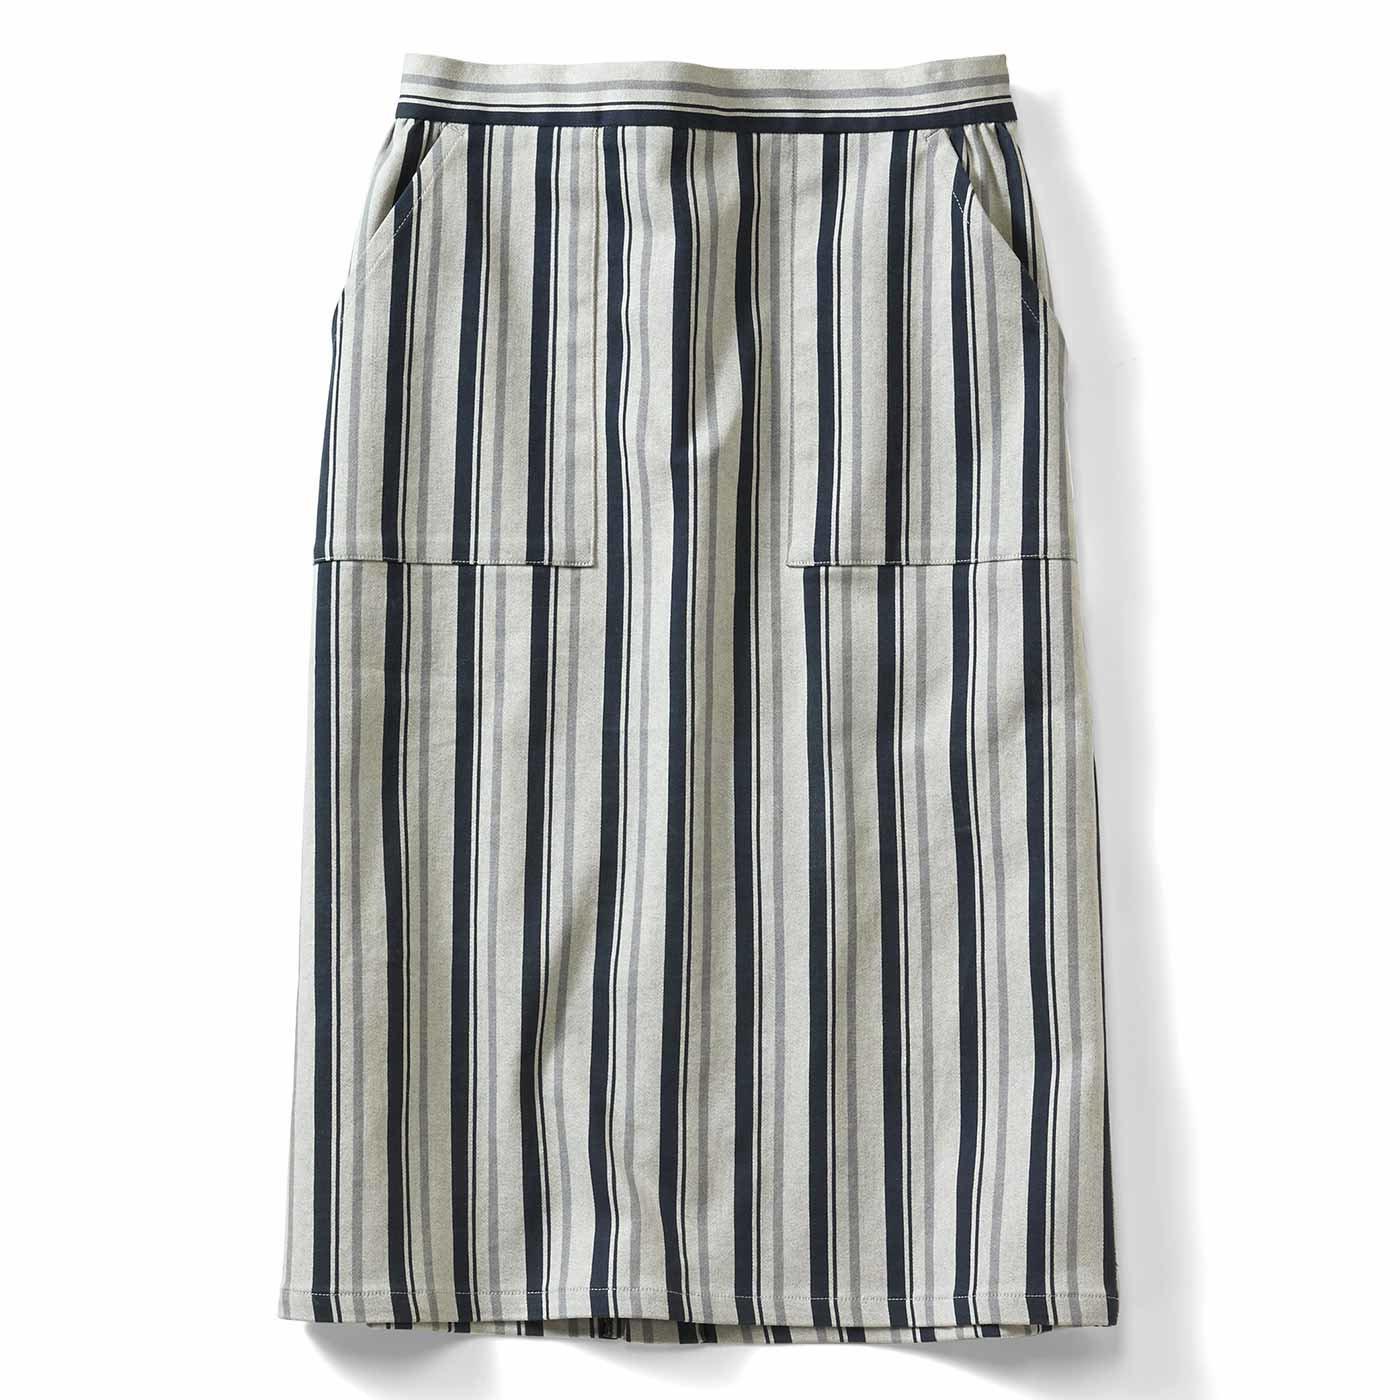 IEDIT[イディット] ストレッチサテン素材で伸びやか ストライプ柄Iラインスカート〈ネイビー〉